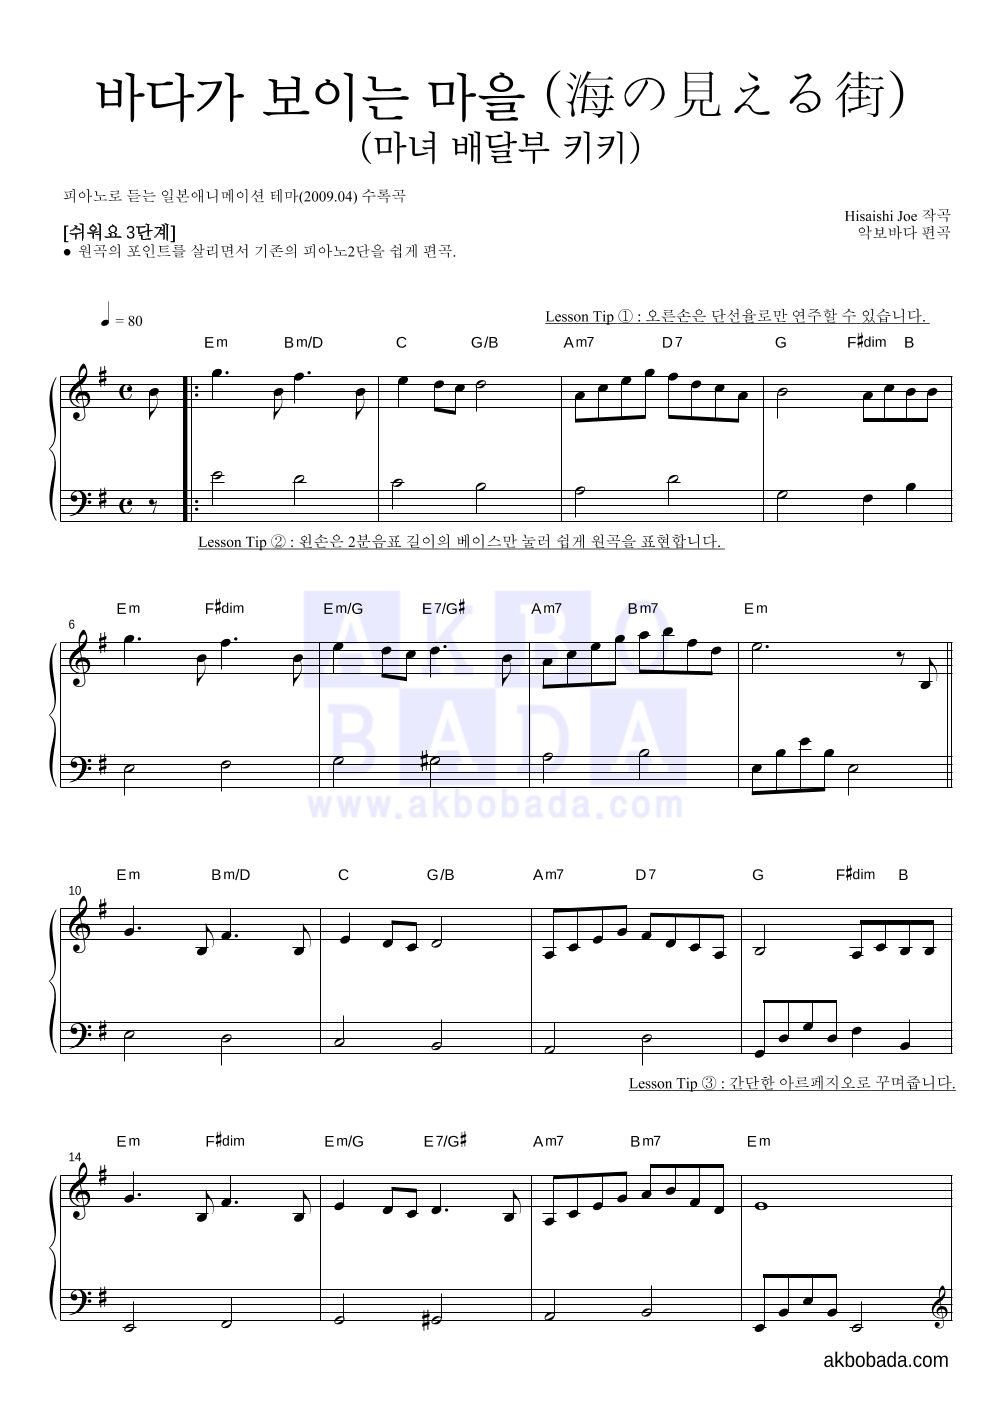 Hisaishi Joe - 海の見える街 / 바다가 보이는 마을 (마녀 배달부 키키) 피아노2단-쉬워요 악보